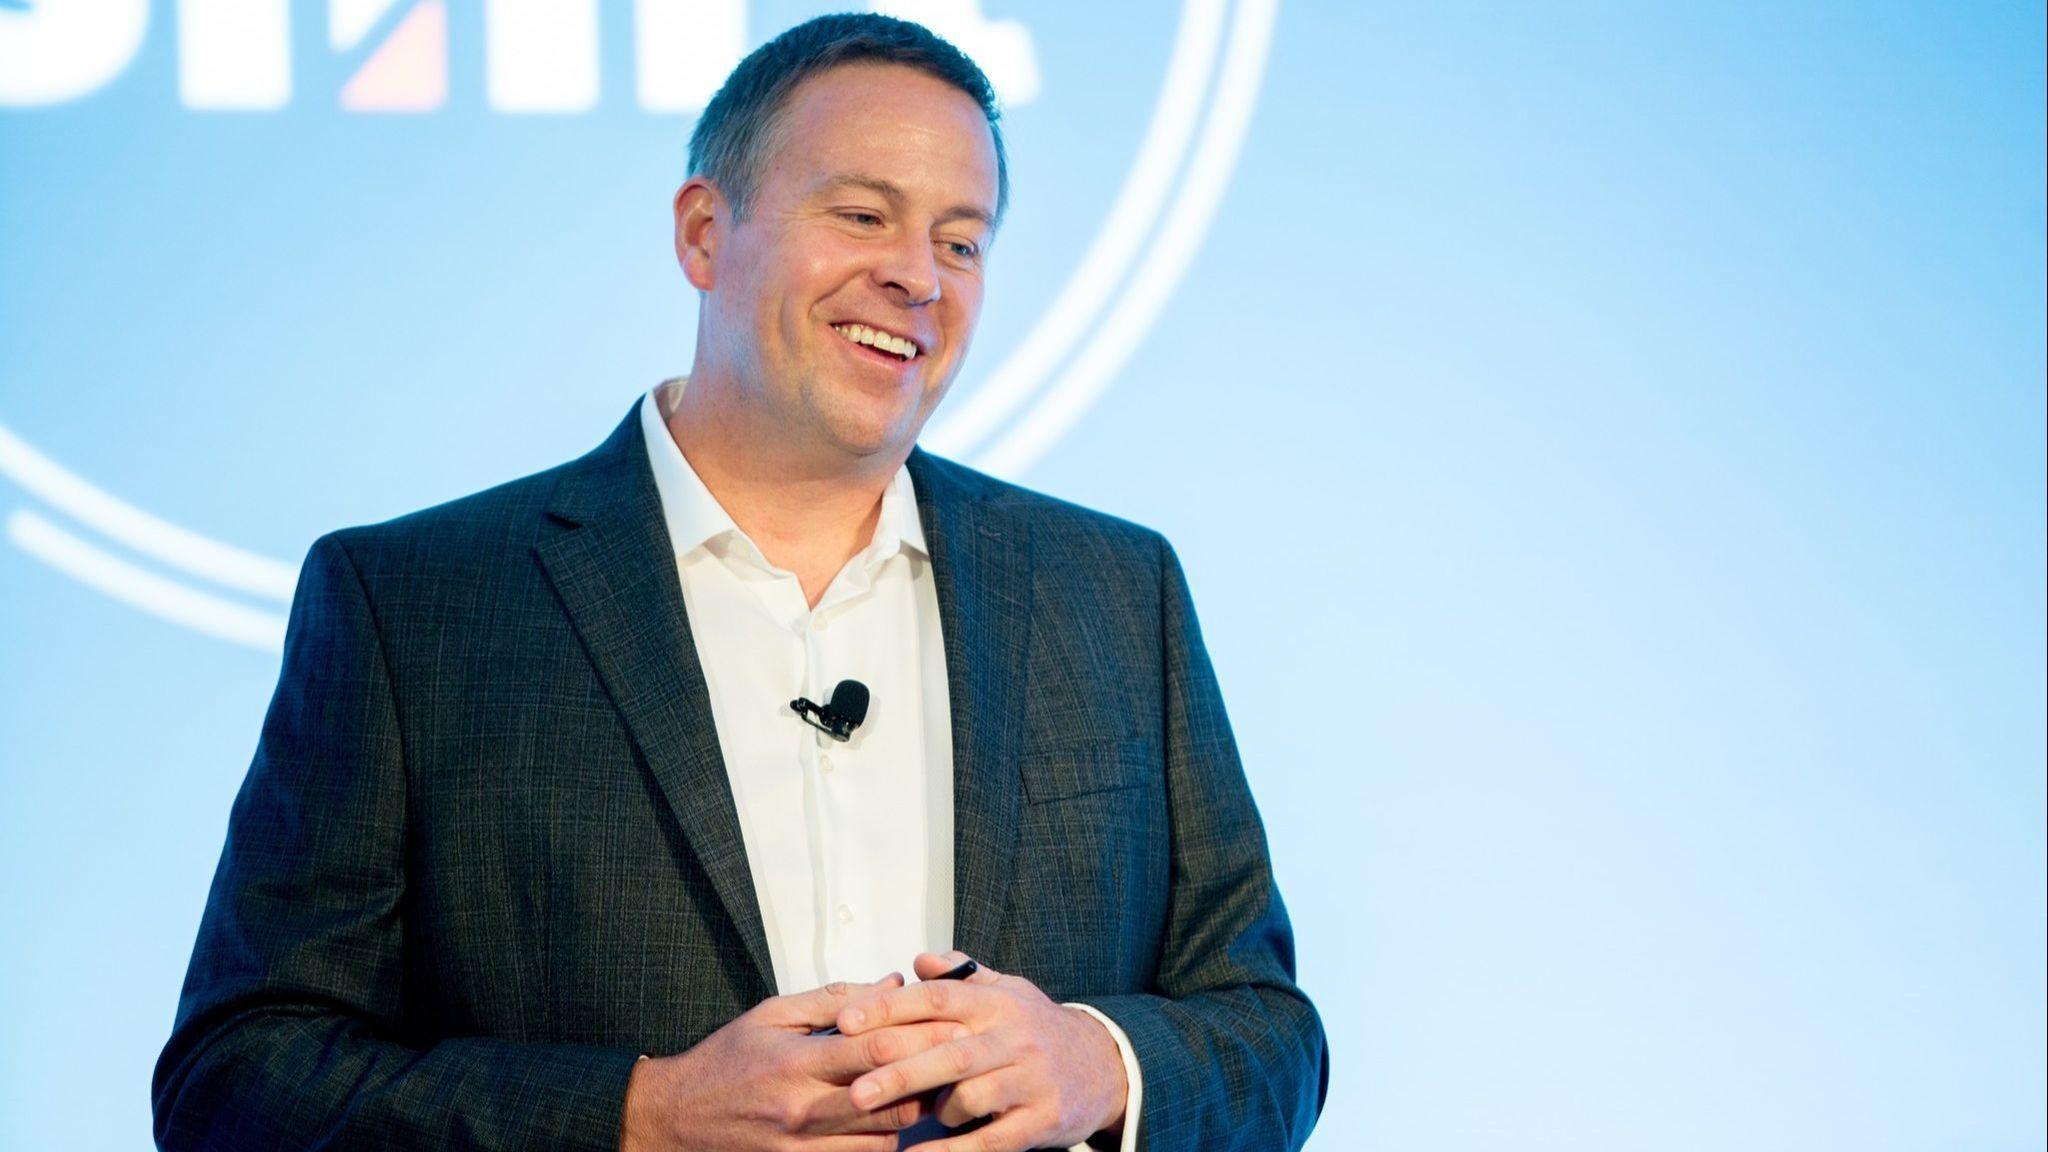 Software startup Seismic gets $100M at $1 billion valuation, making it San Diego's latest unicorn